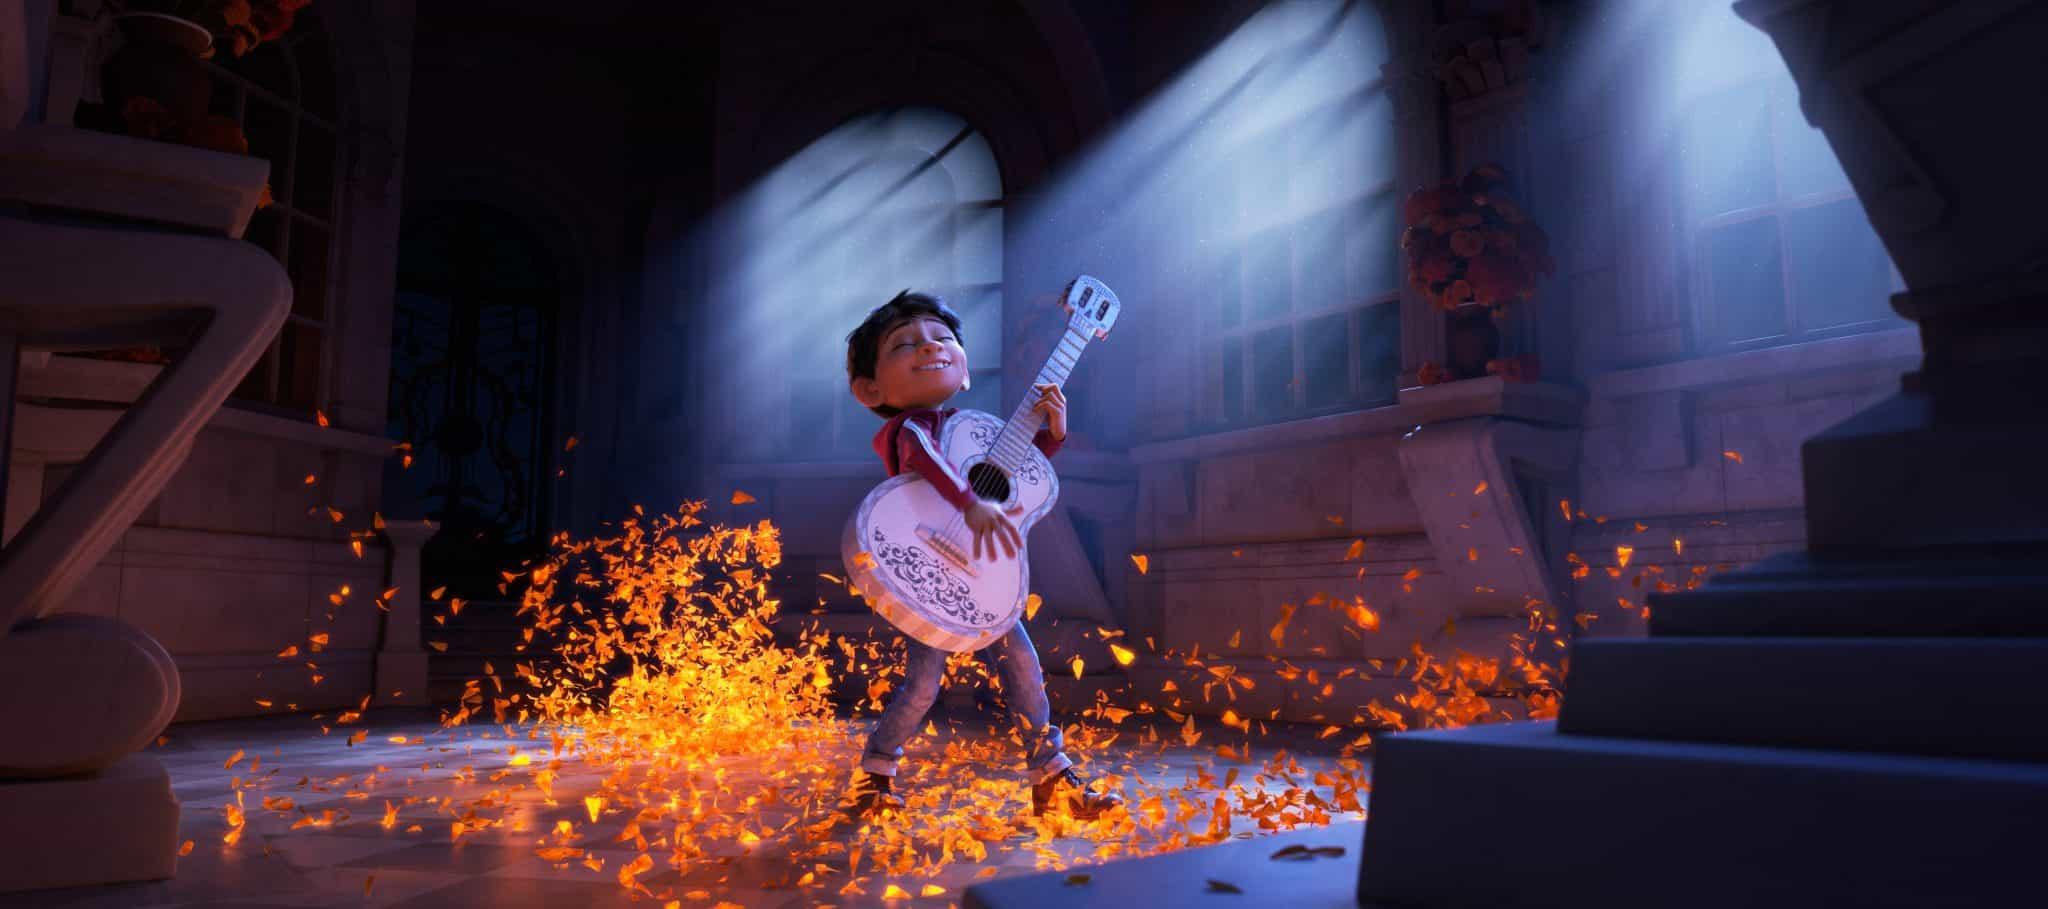 New Teaser Trailer for Disney Pixar's COCO! #Coco